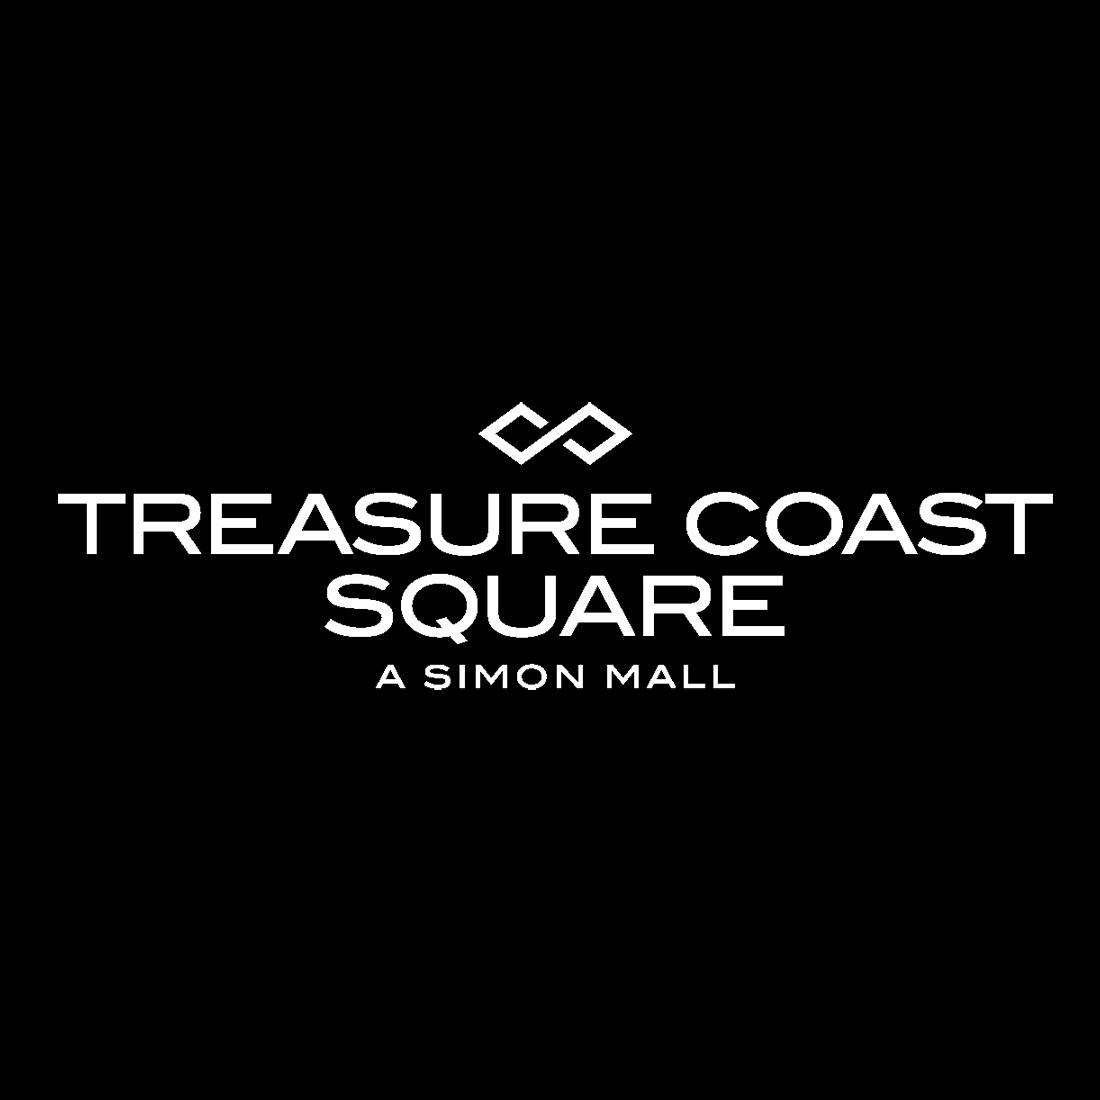 Treasure Coast Square